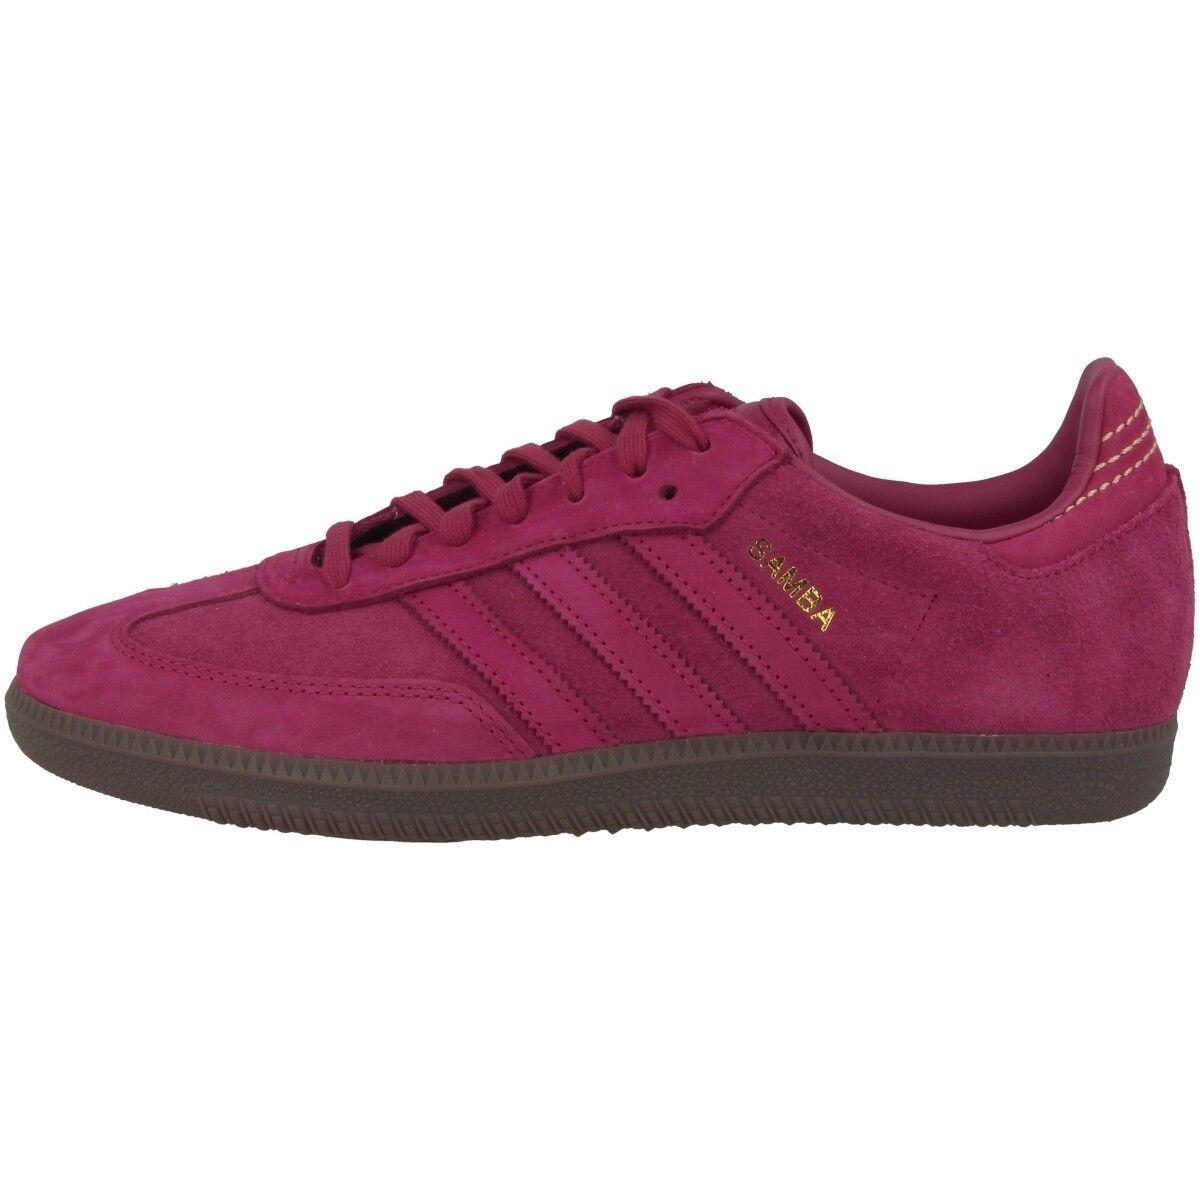 Adidas Samba FB Schuhe Originals Freizeit Fussball Sneaker mystery ruby CQ2091